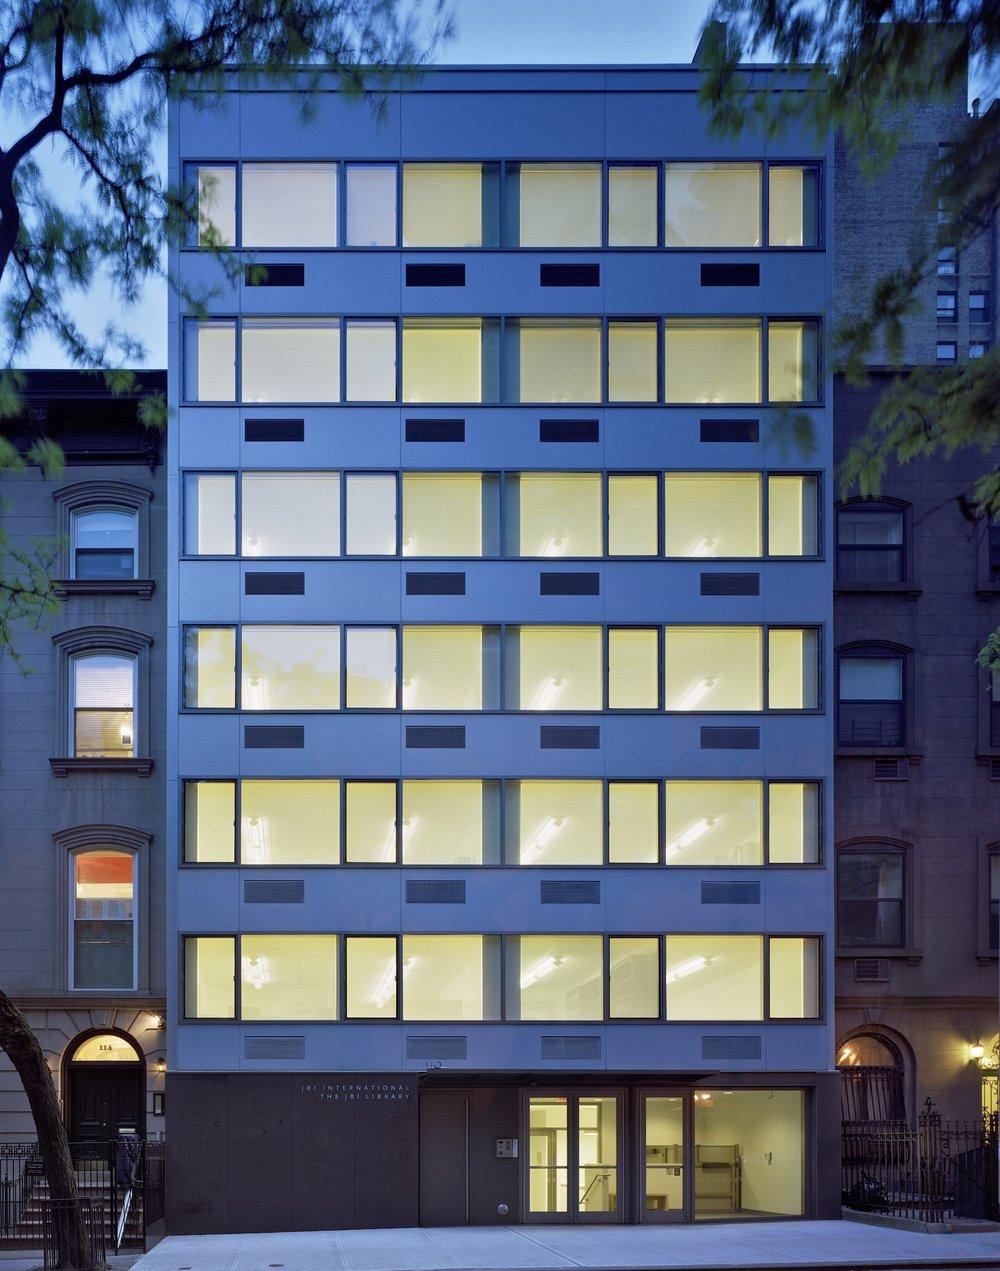 Fink & Platt Architects